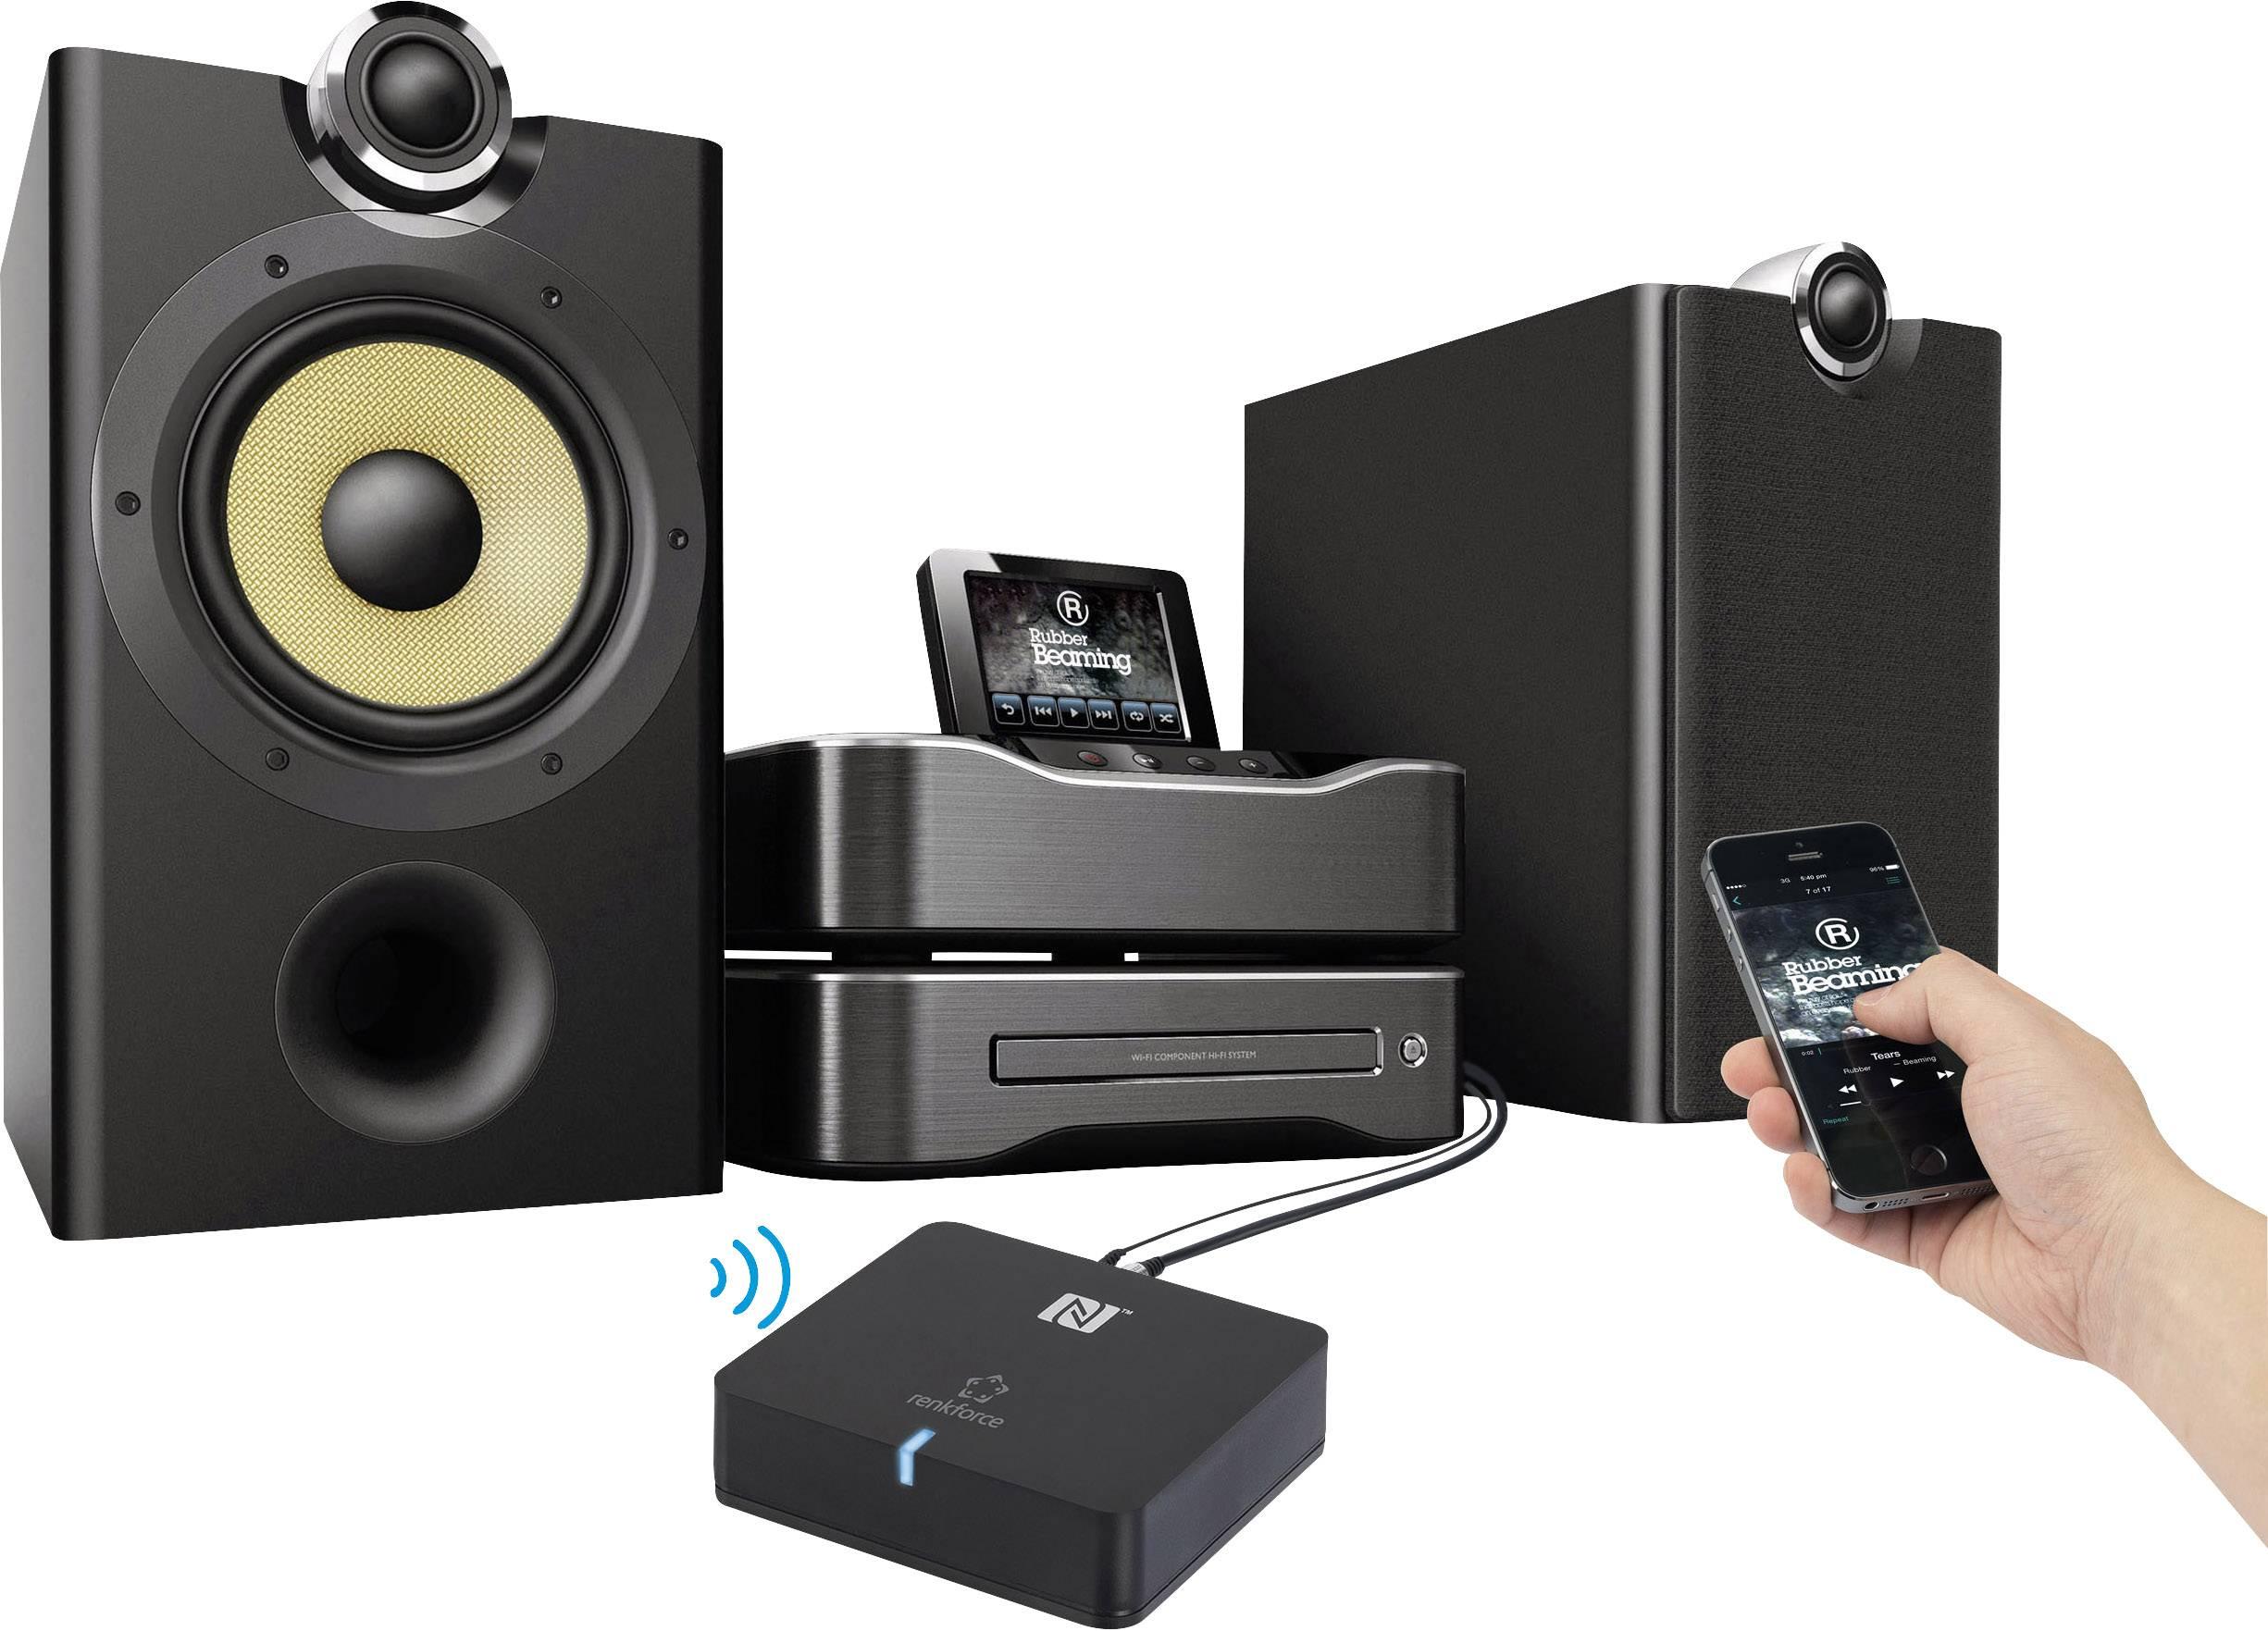 Bluetooth audio přijímač Renkforce, Bluetooth 3.0 +EDR, A2DP, dosah 10 m